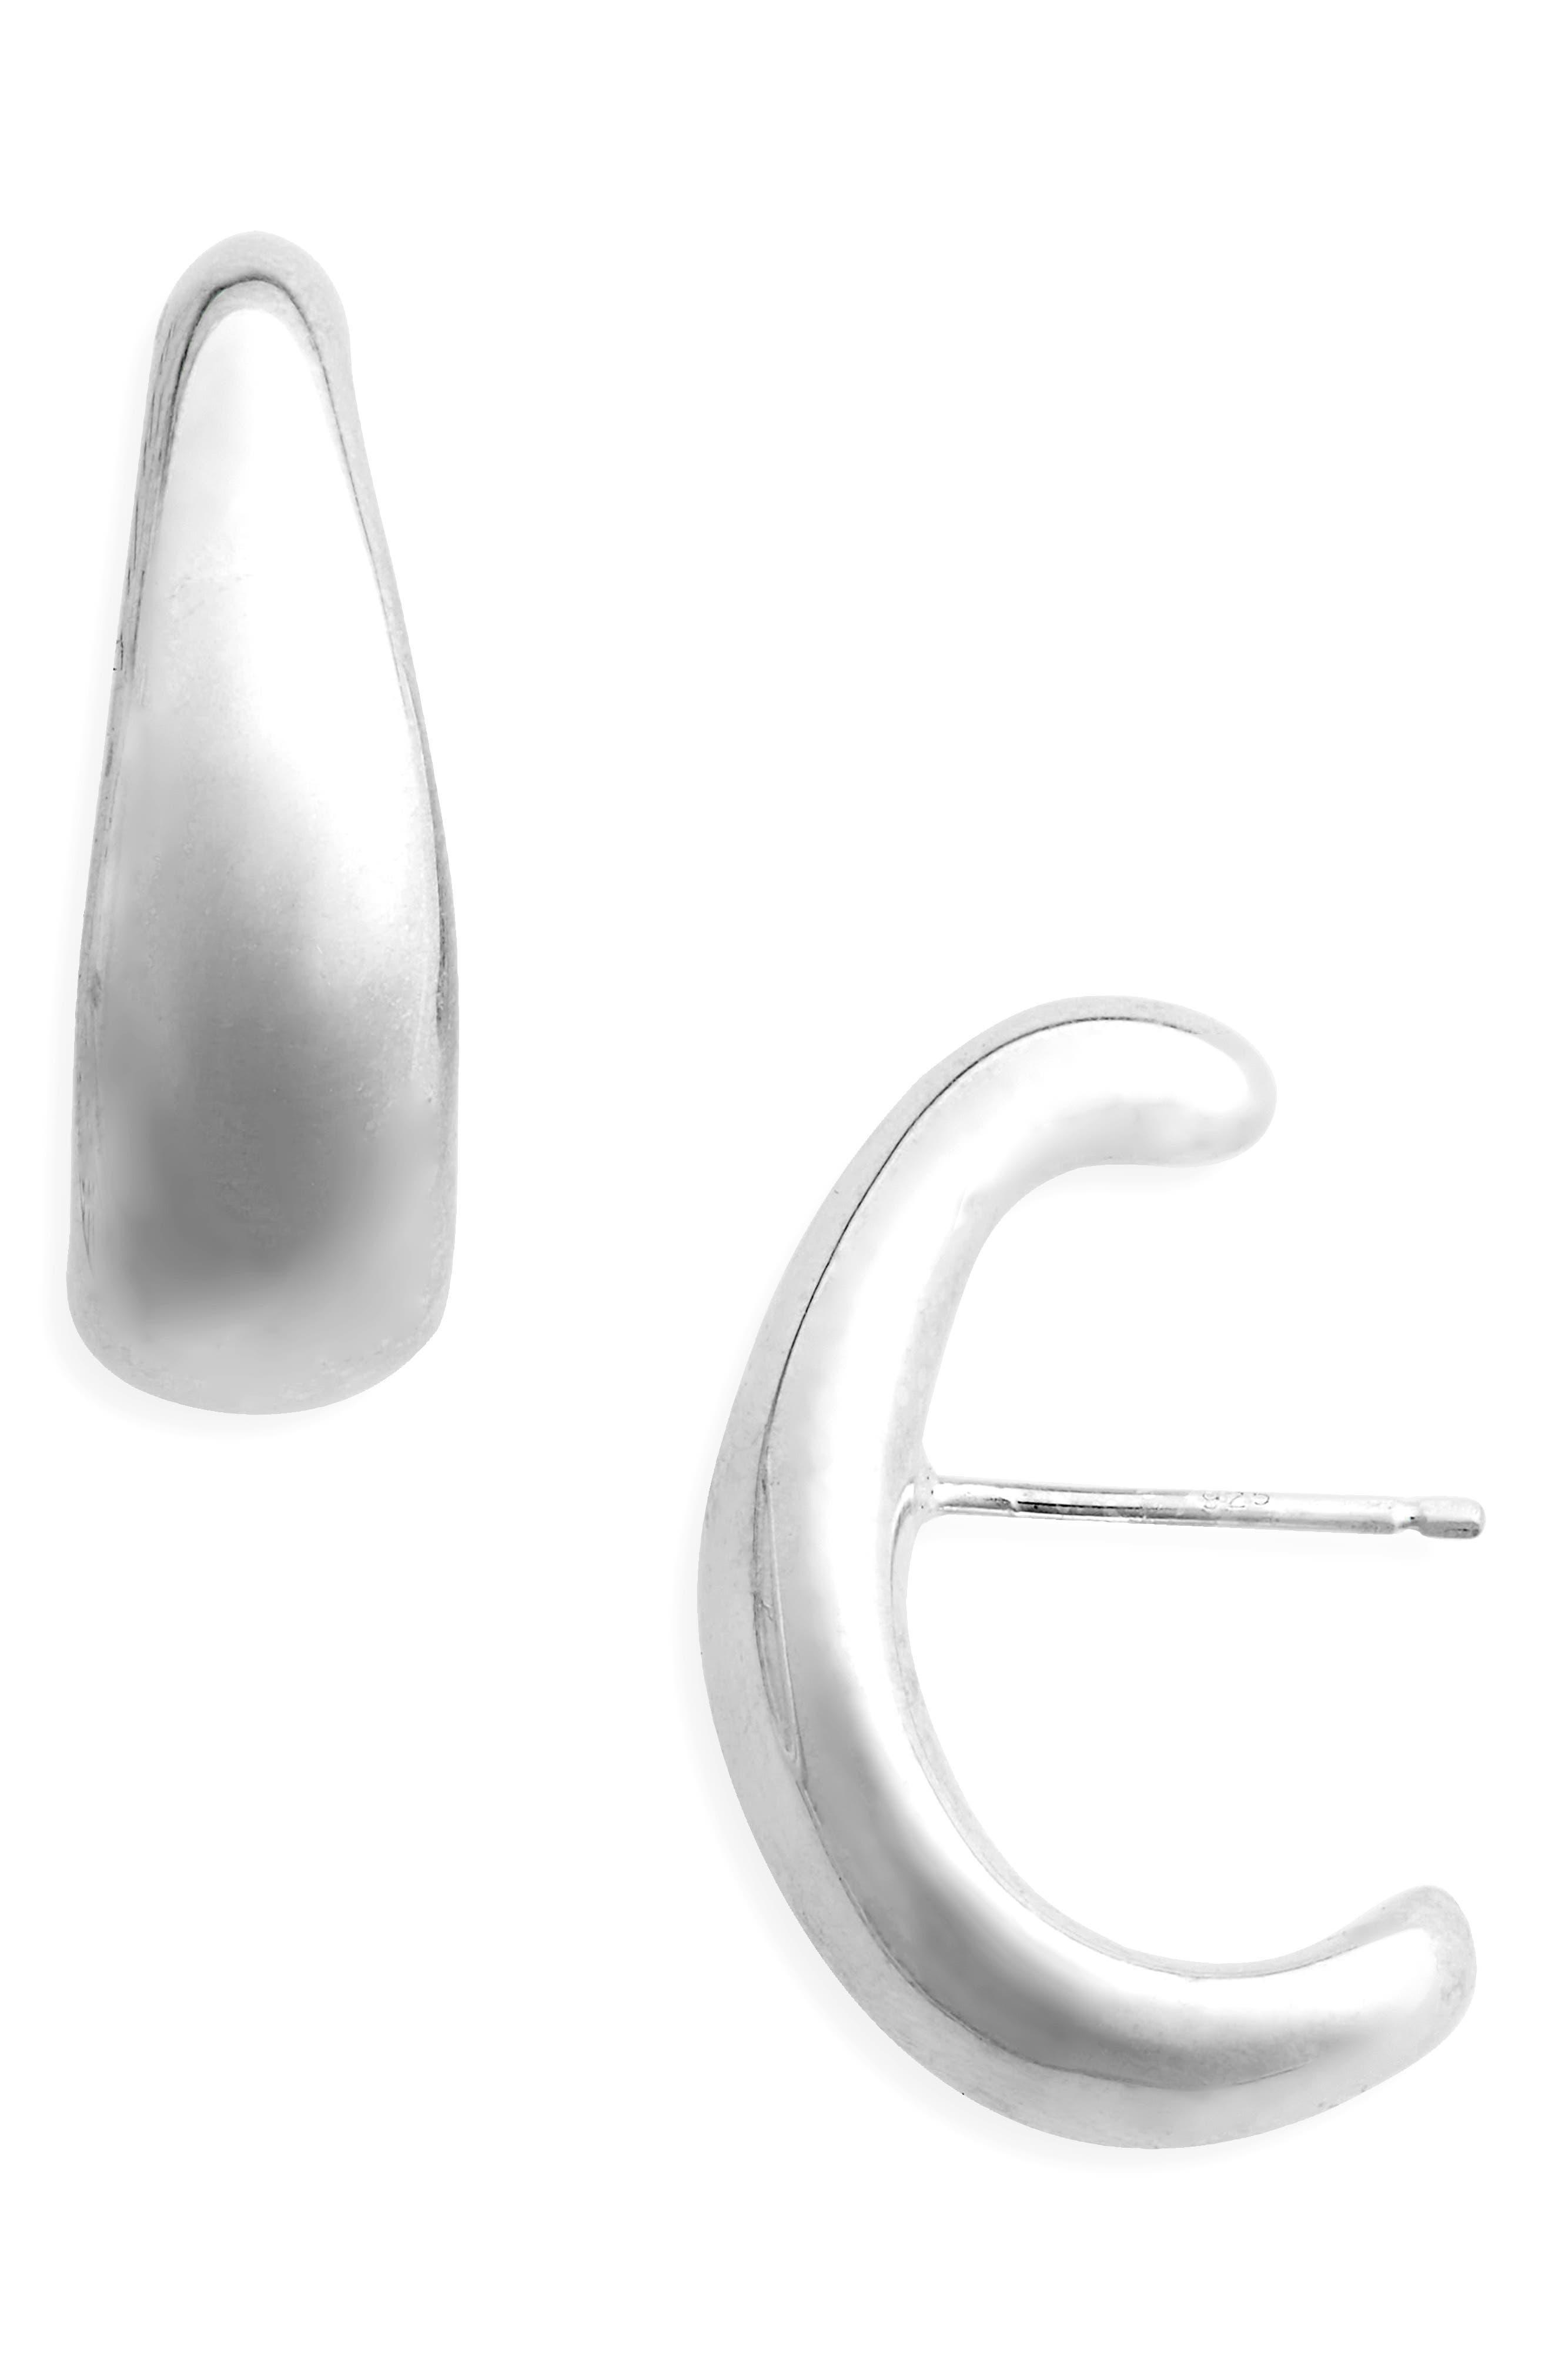 Large Lobe Earrings,                         Main,                         color, Sterling Silver